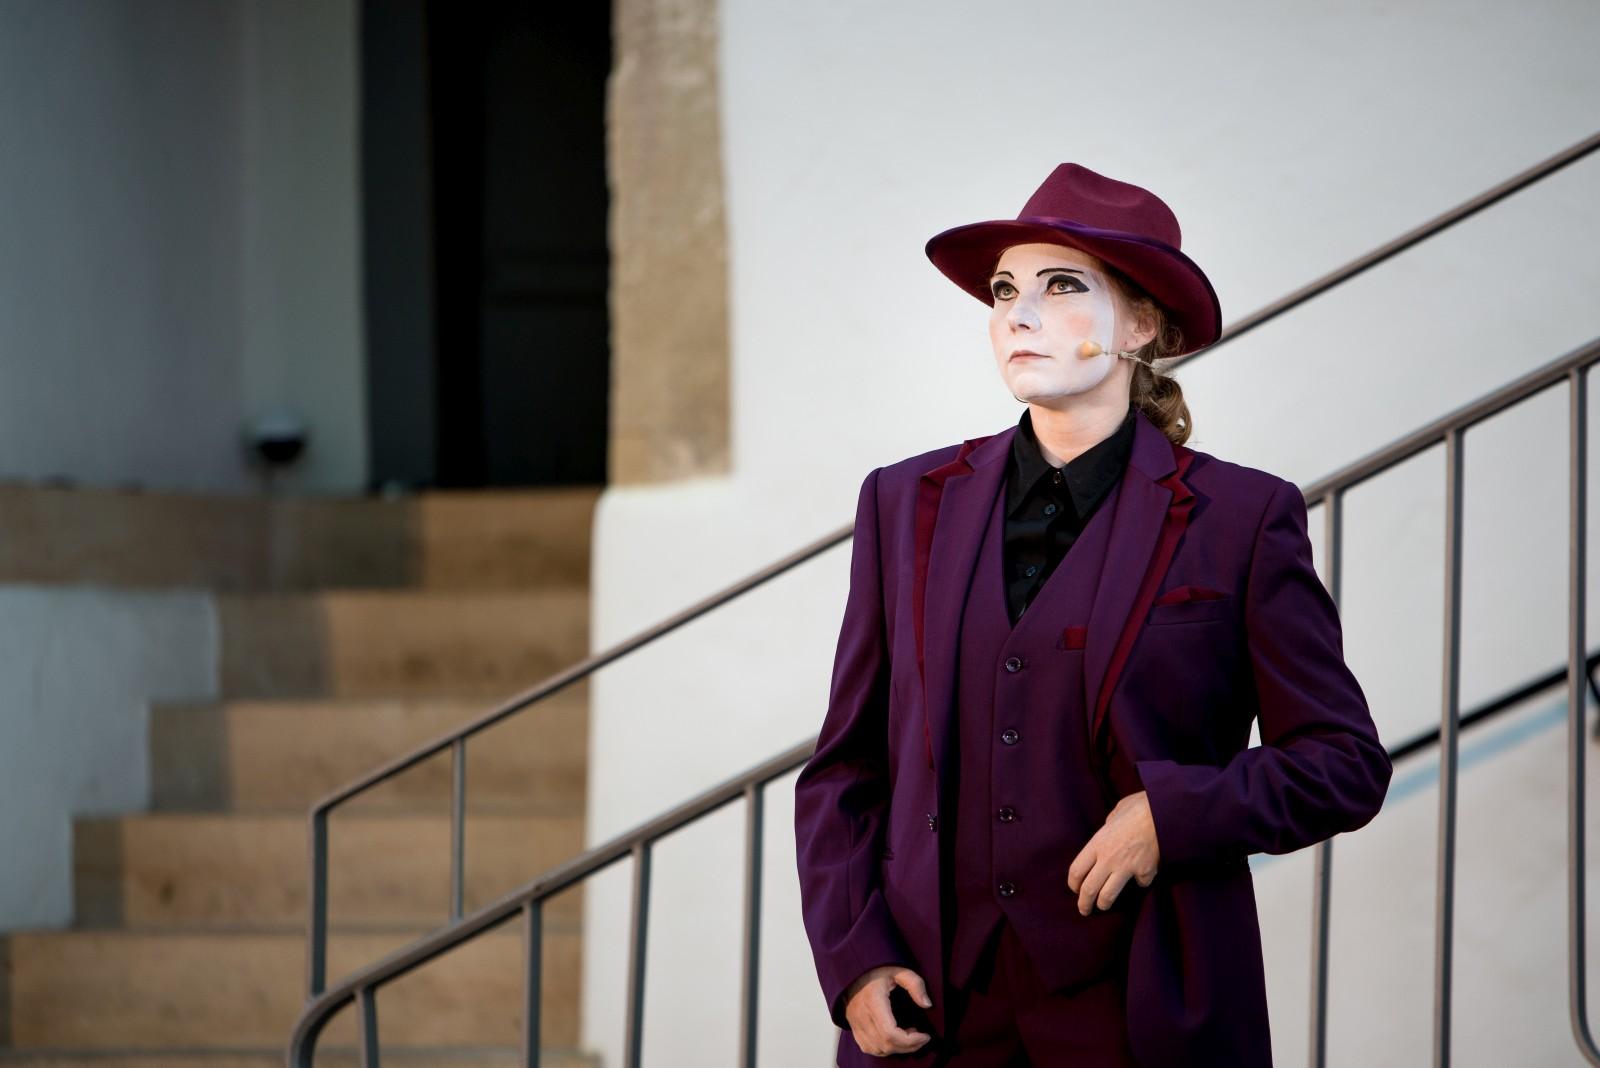 2019: Beatrice in Der Diener zweier Herren